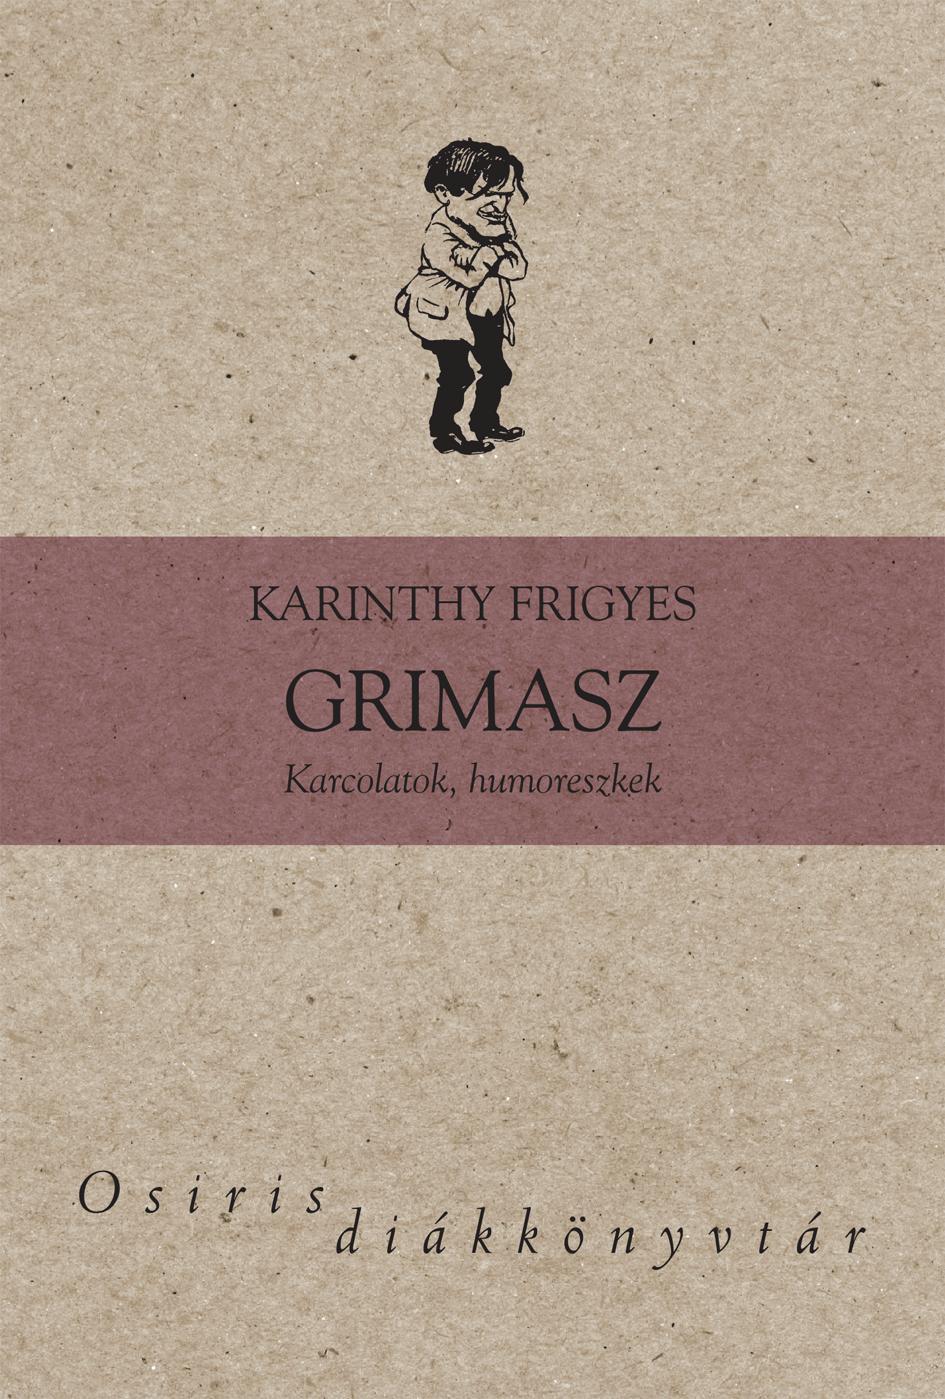 GRIMASZ - OSIRIS DIÁKKÖNYVTÁR -